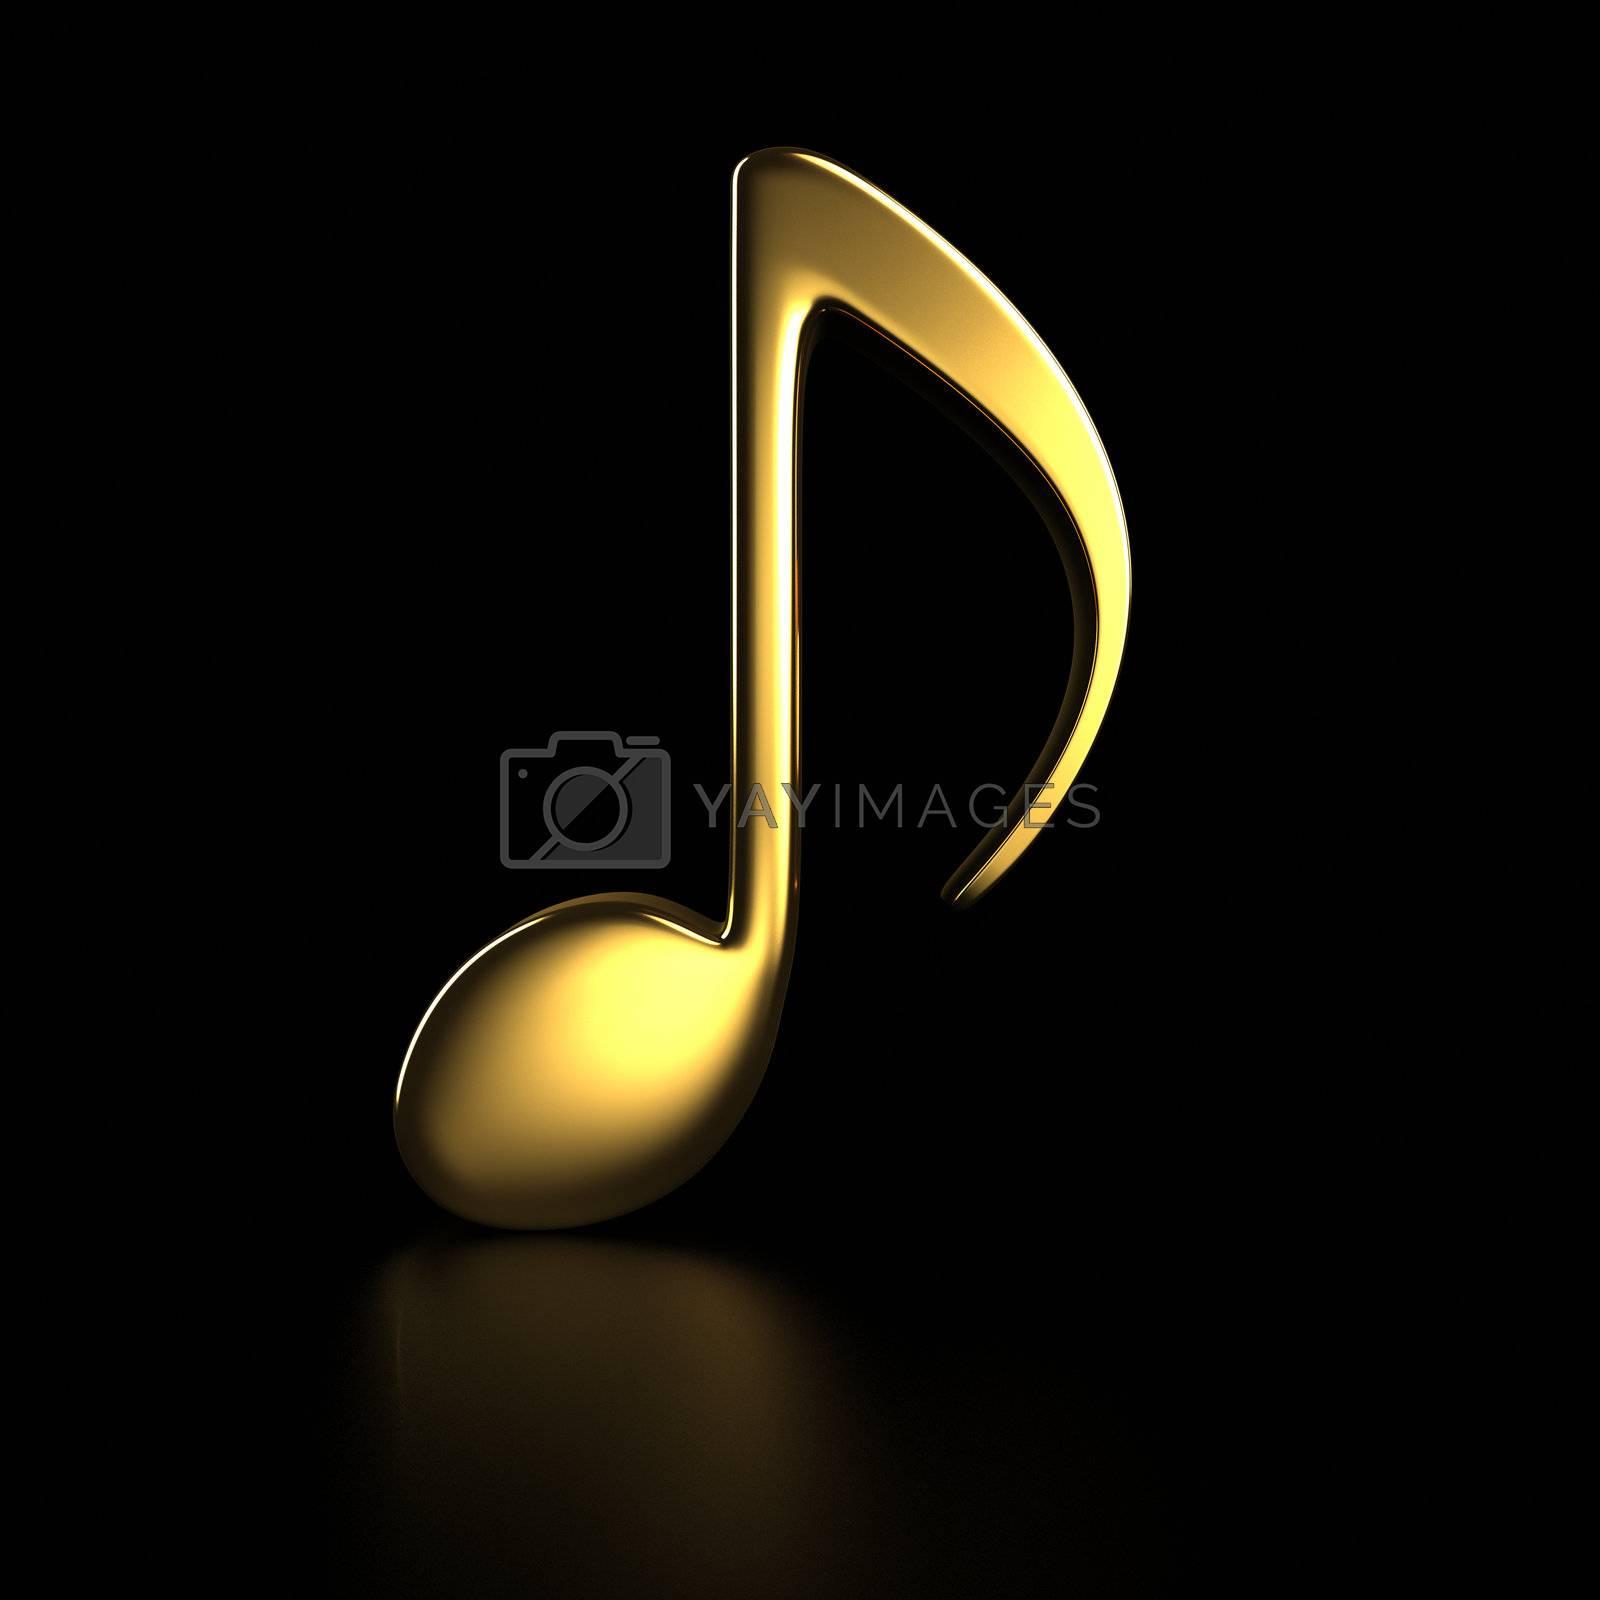 Golden note symbol on the black background